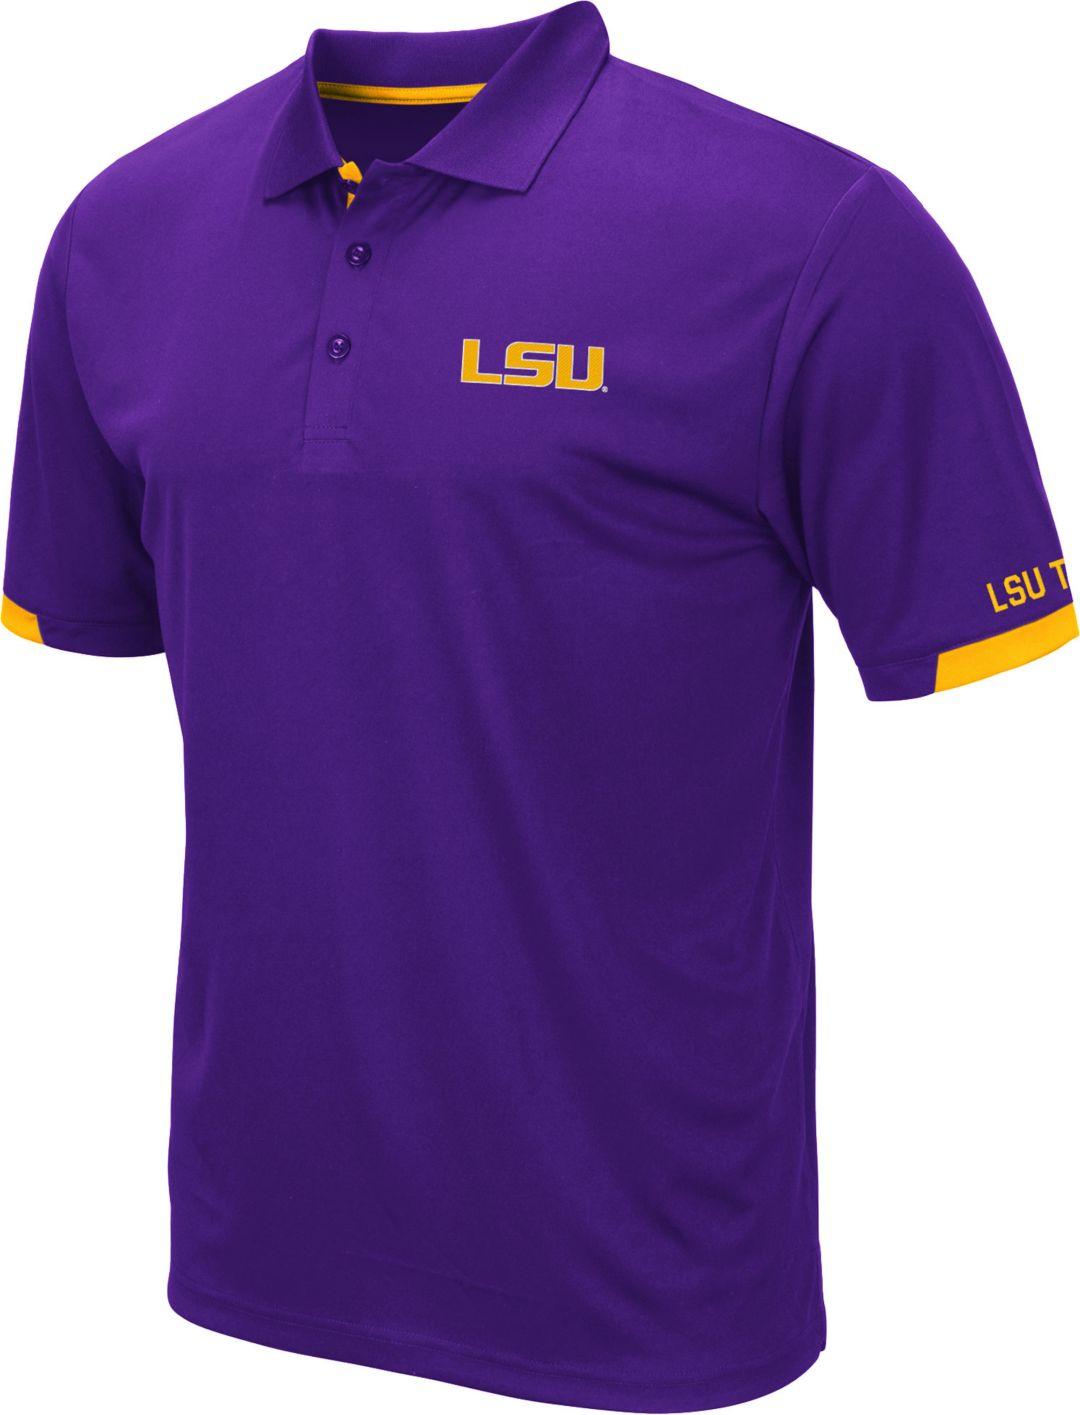 00f9ba254014 Colosseum Men's LSU Tigers Purple Fairway Polo | DICK'S Sporting Goods